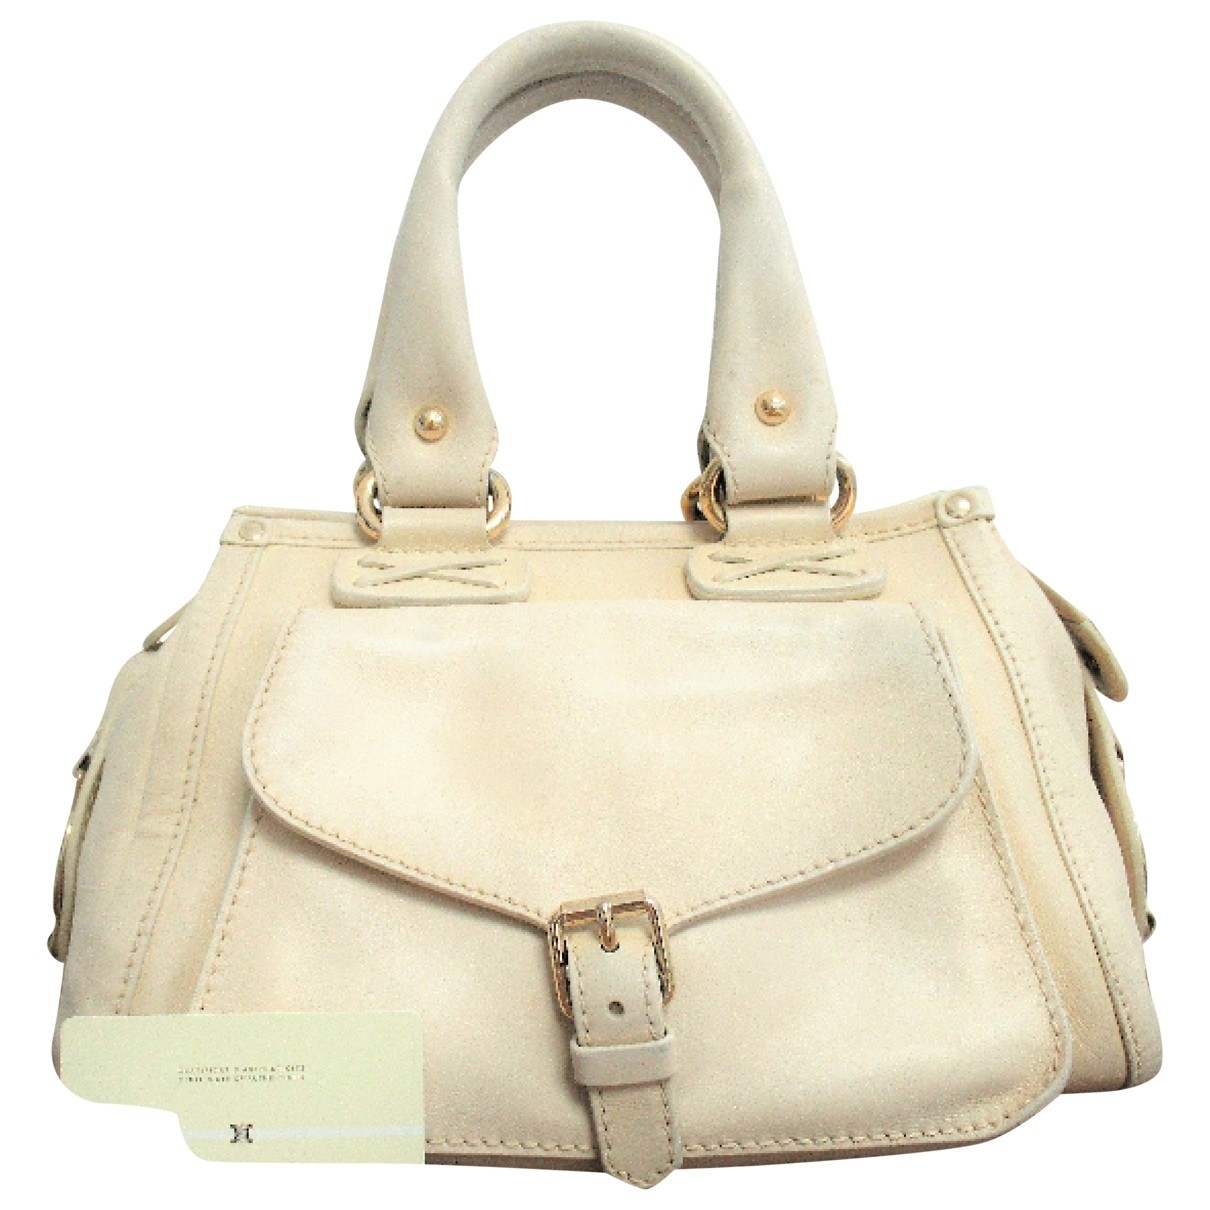 Celine \N Handtasche in  Beige Leder